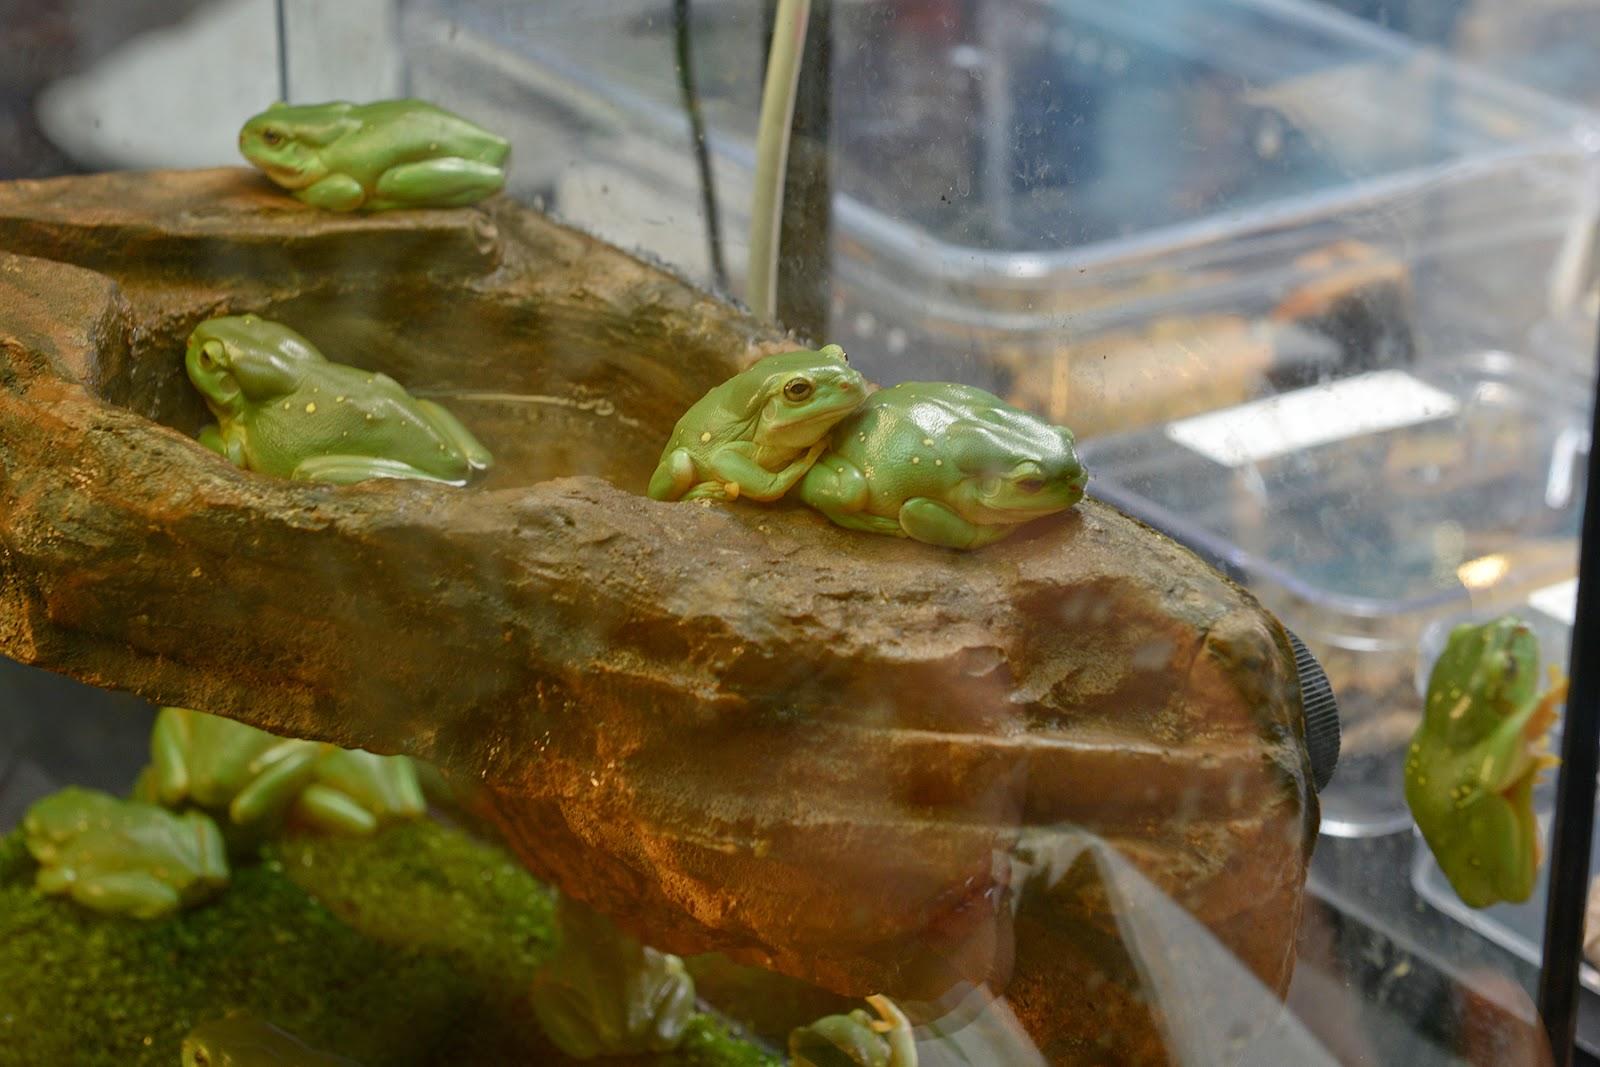 Magnificent tree frog Littoria splendida